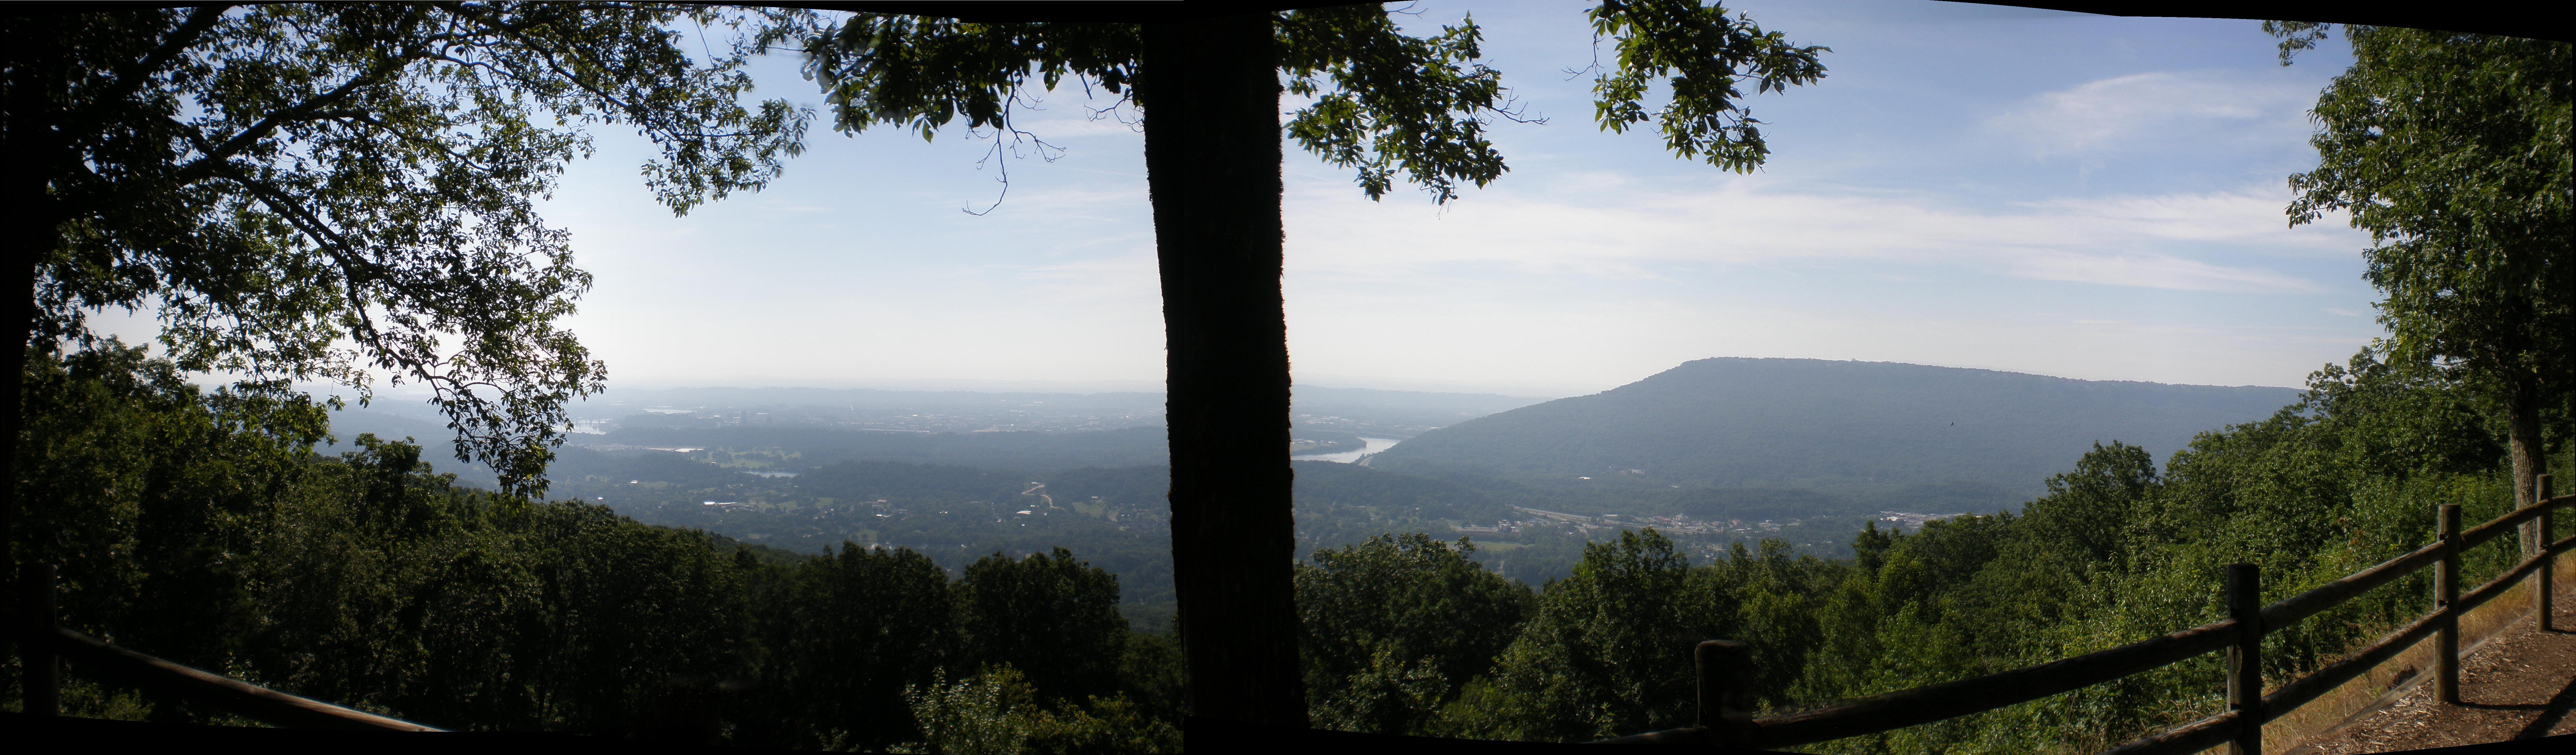 Raccoon Mountain TN